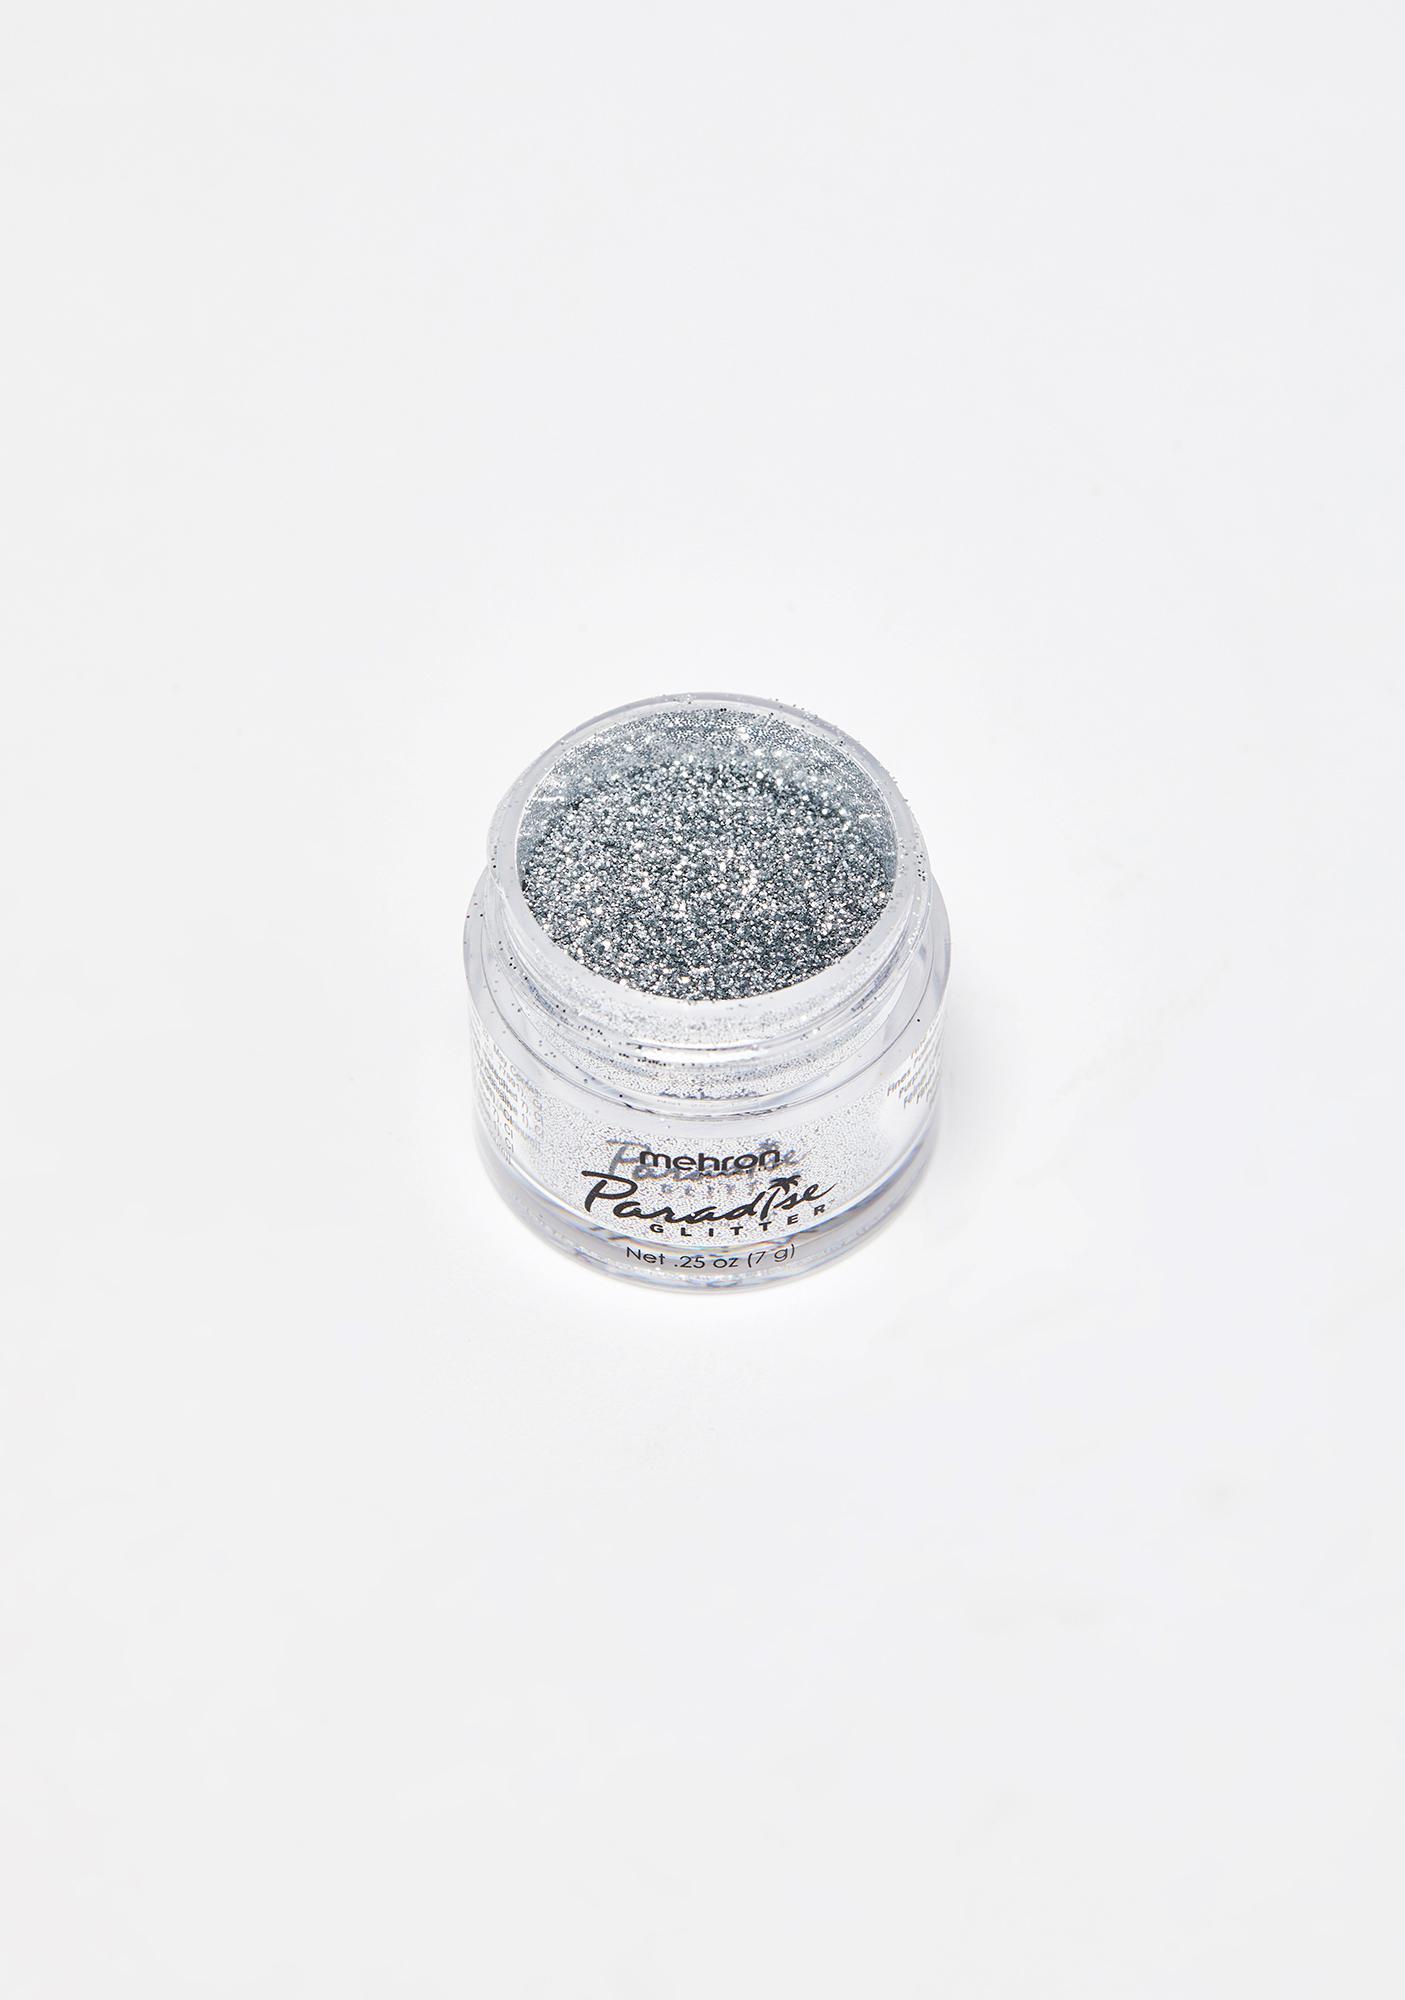 Mehron Paradise AQ Glitter